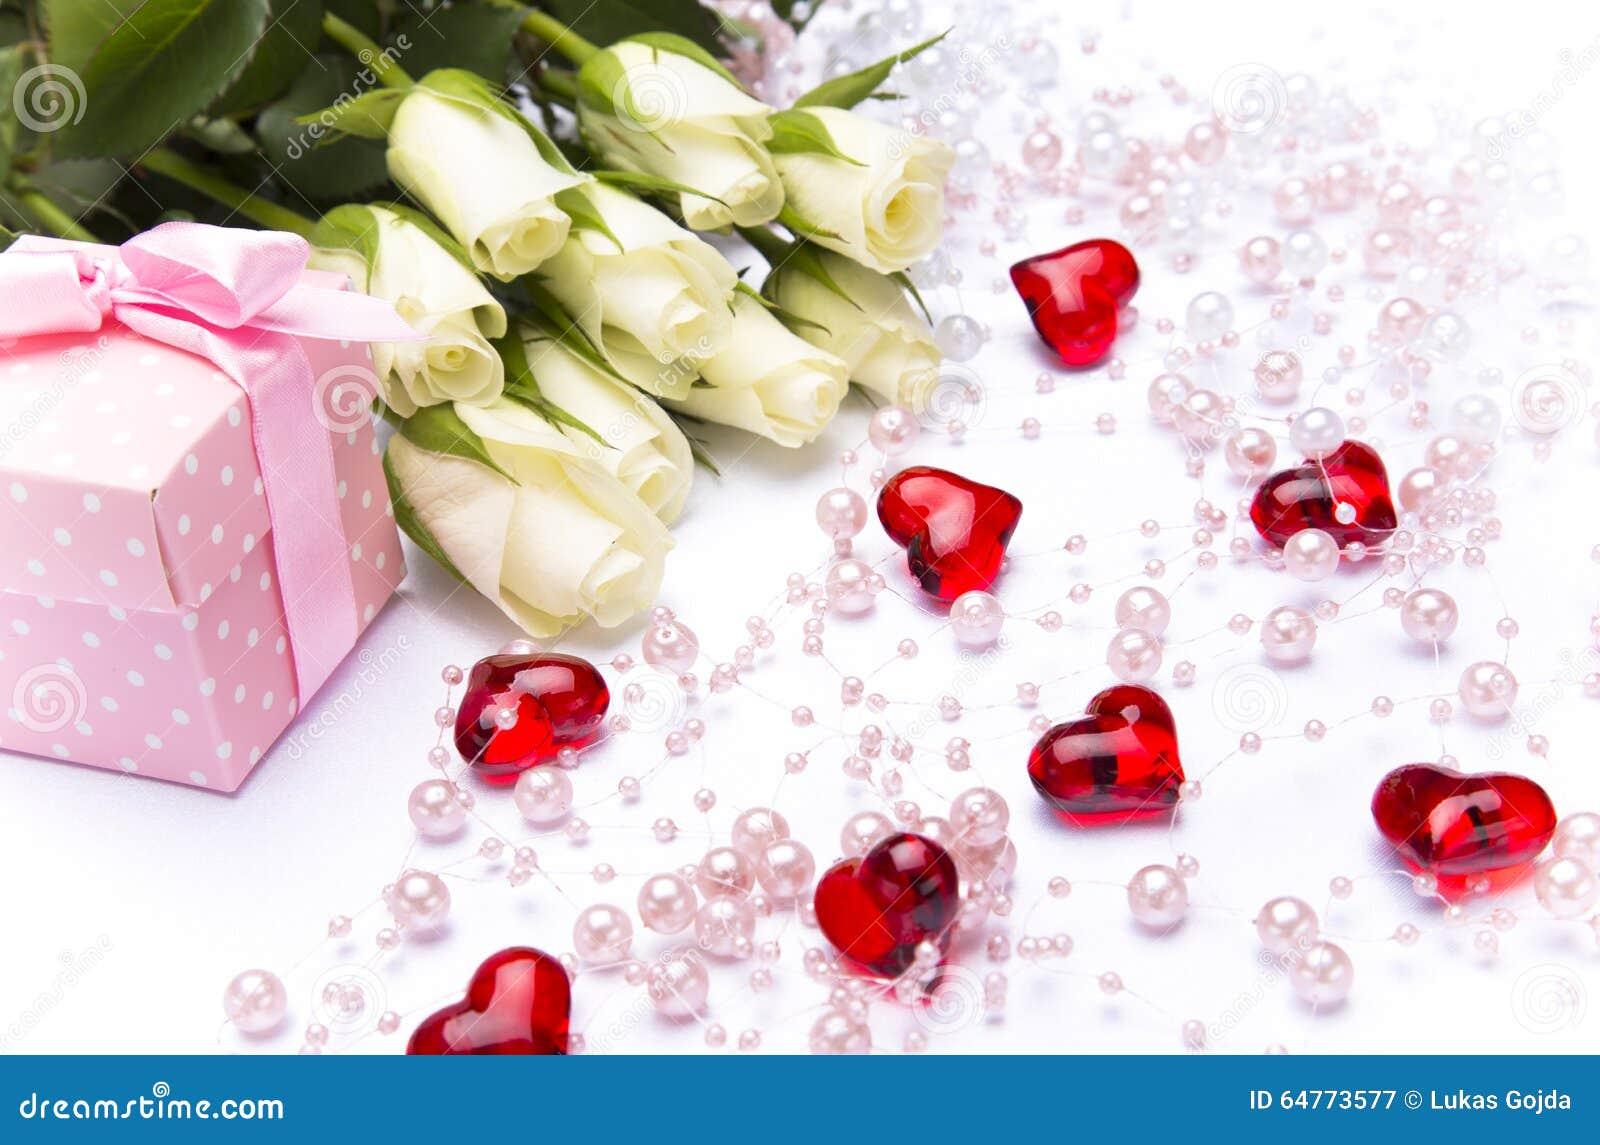 Valentine Gift Background Stock Image Image Of Blurred 64773577